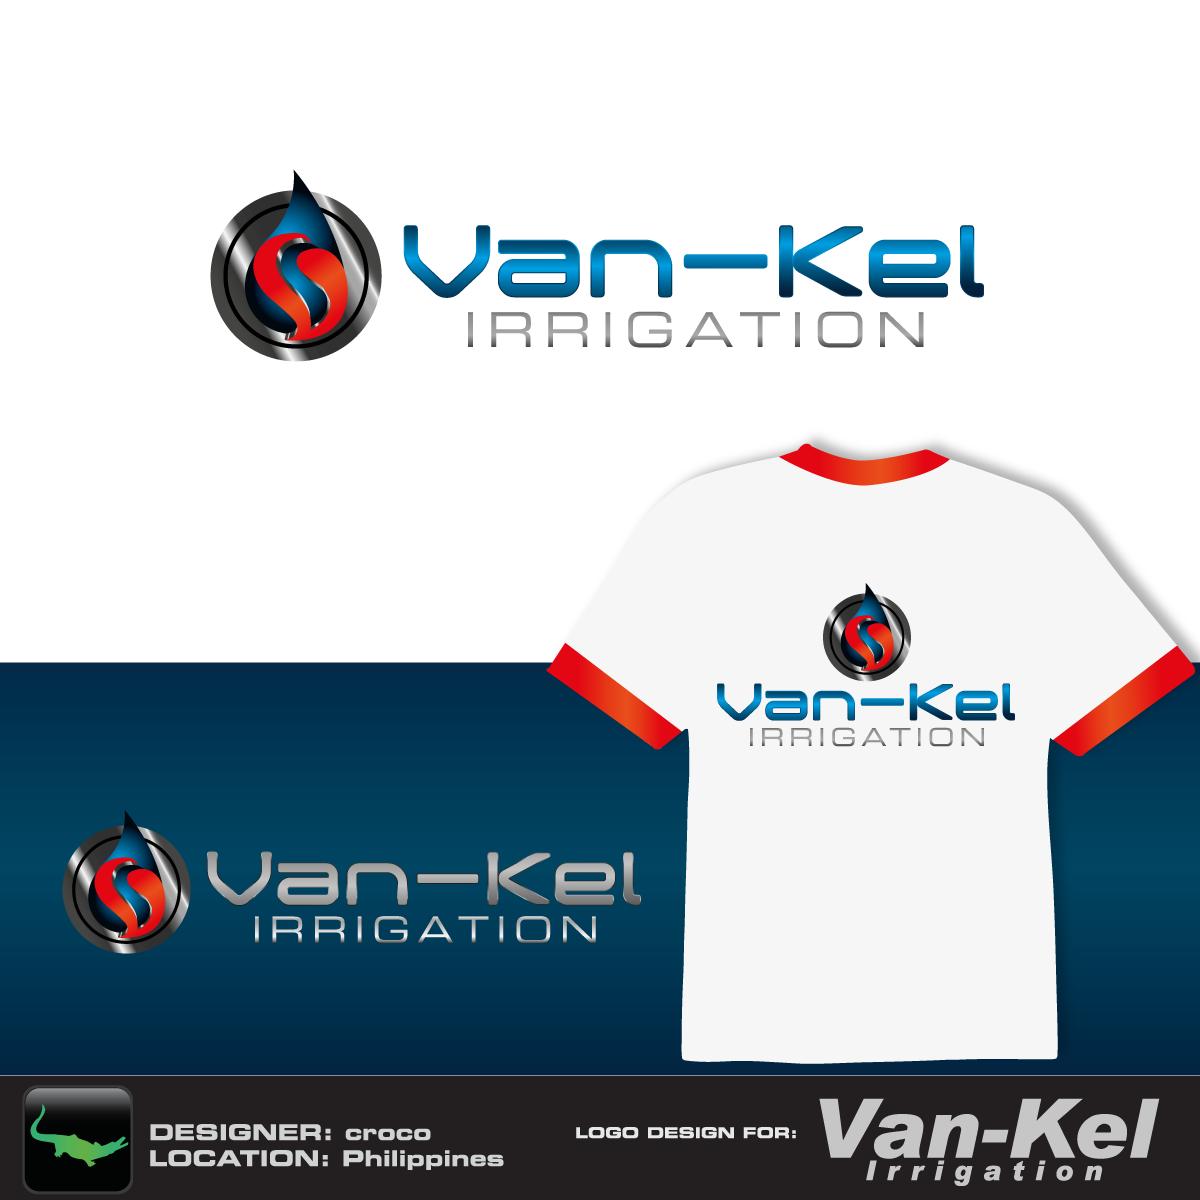 Logo Design by rockin - Entry No. 26 in the Logo Design Contest Van-Kel Irrigation Logo Design.